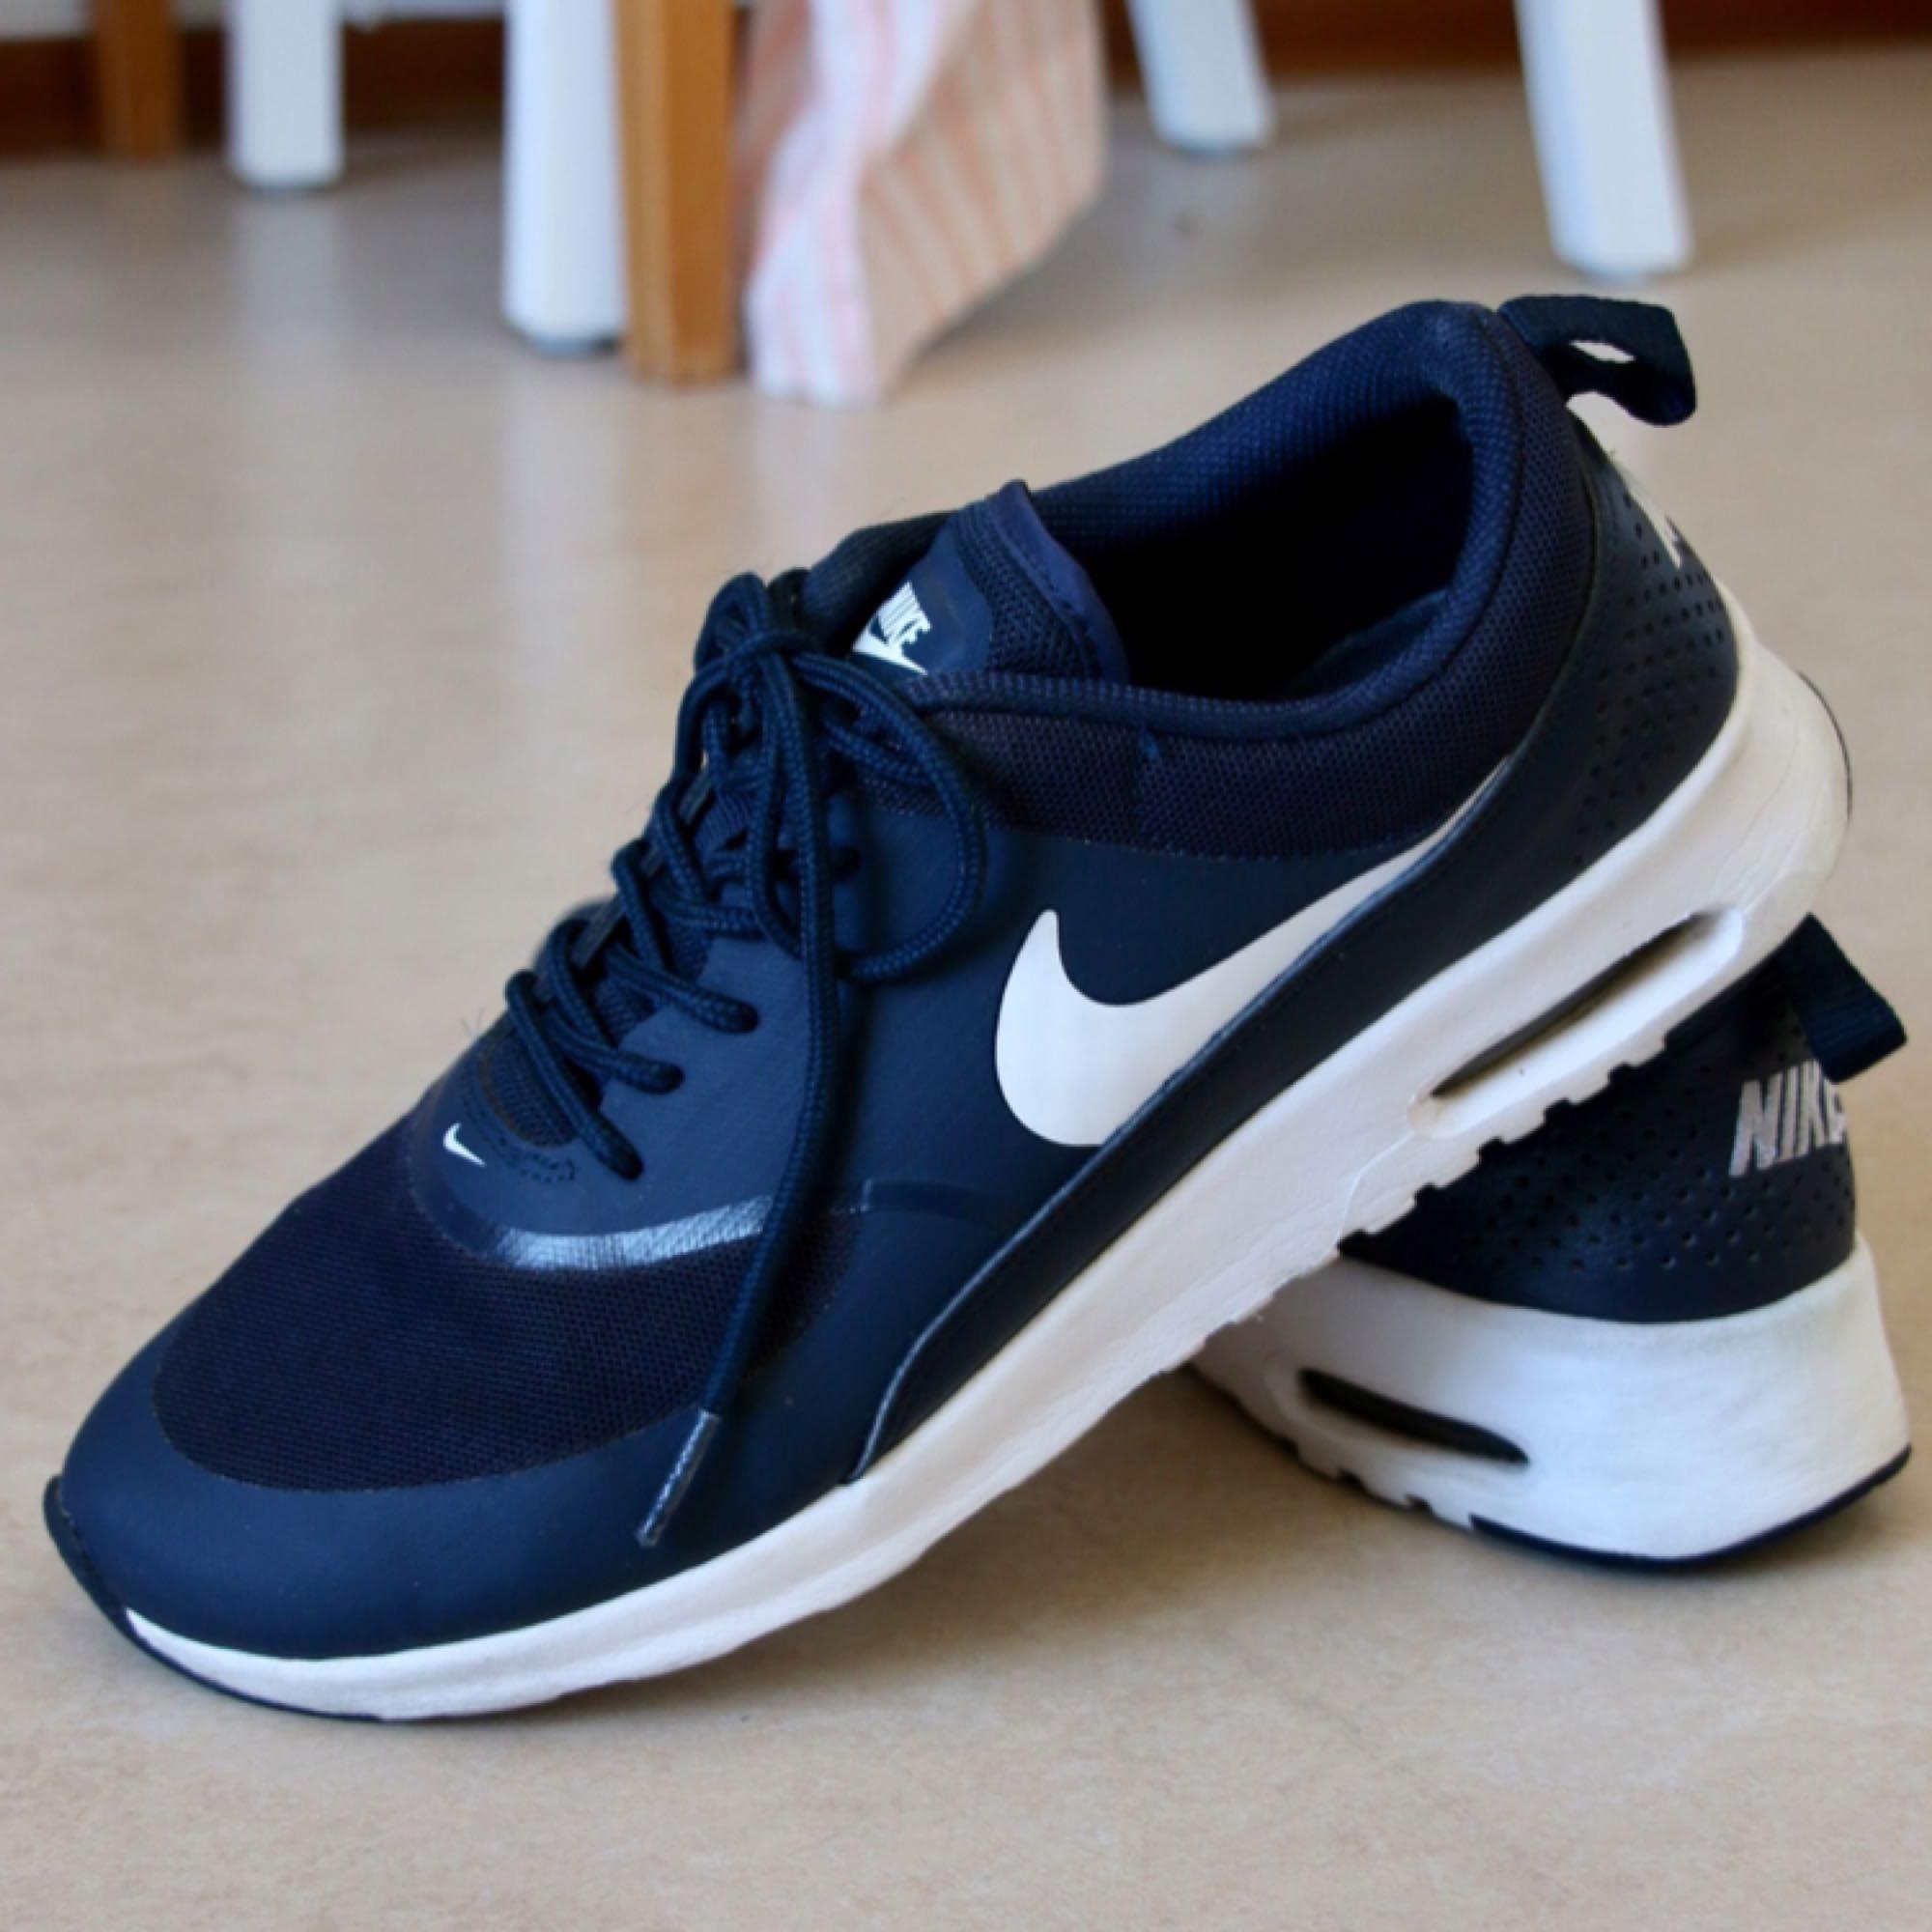 huge selection of 59867 75c98 Nike Air Max Thea! Har nästen ej använt dom pga for små.